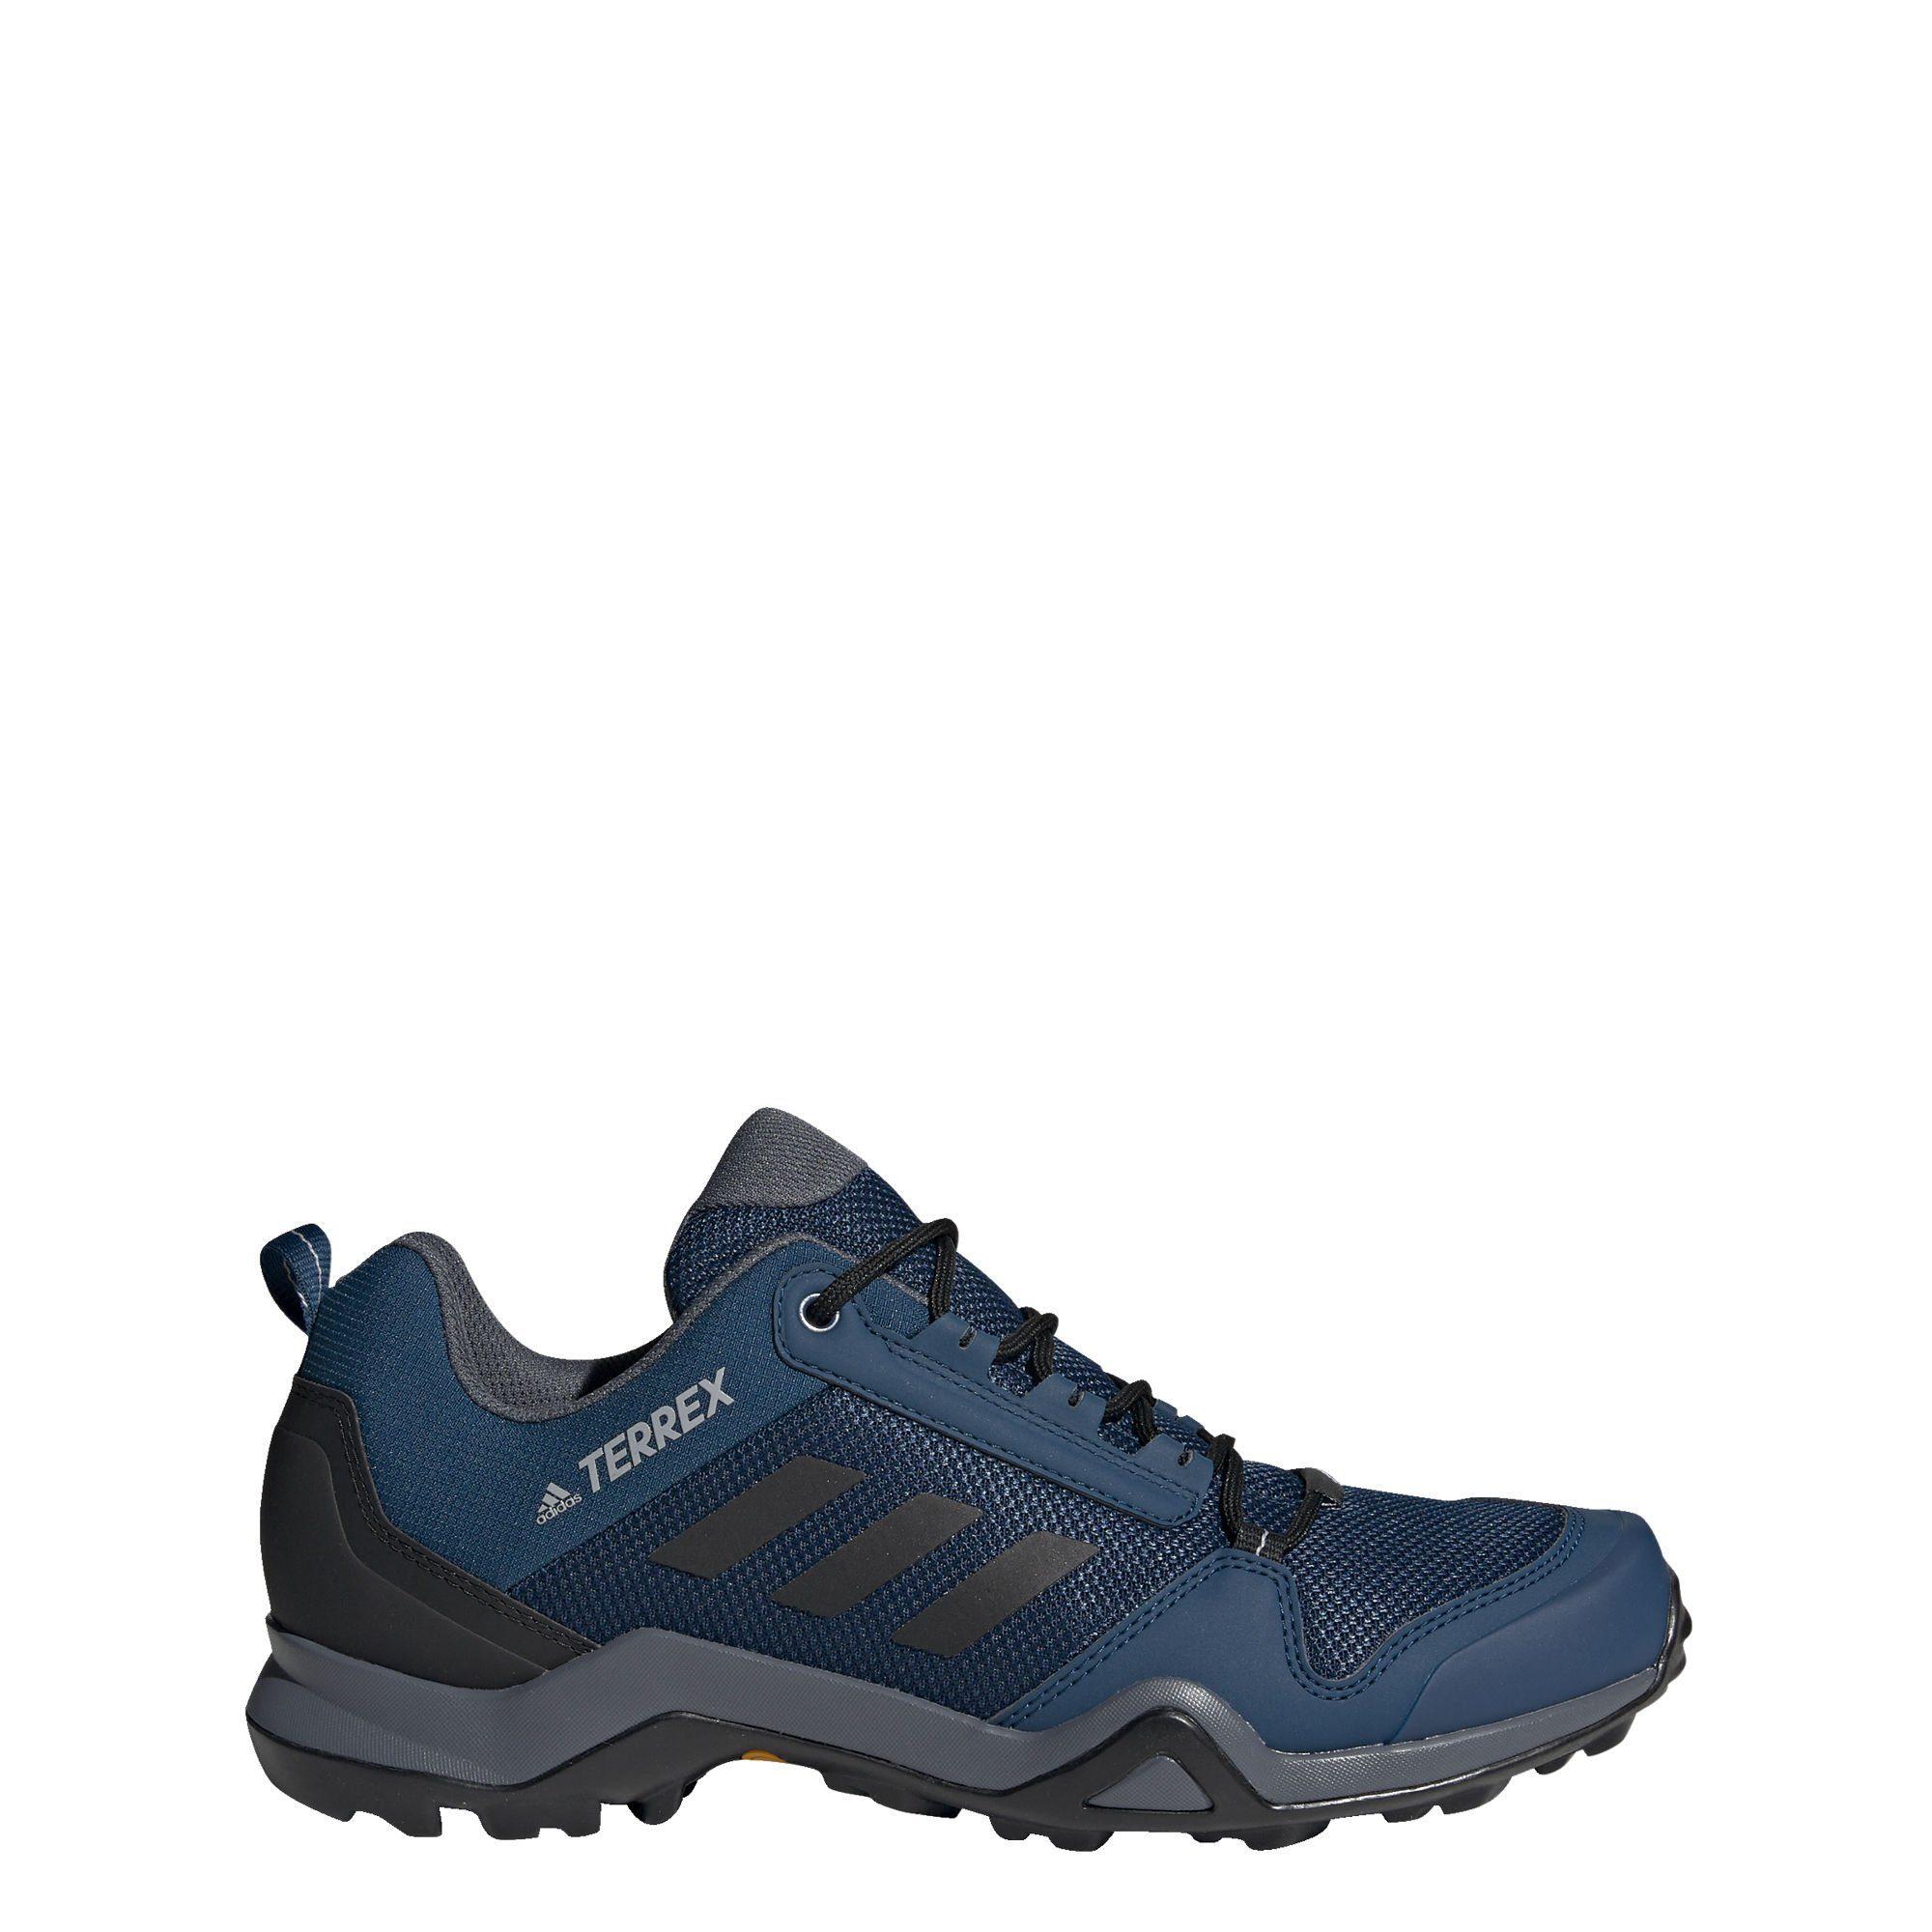 adidas Performance »TERREX AX3 Schuh« Outdoorschuh Outdoorschuh online kaufen | OTTO